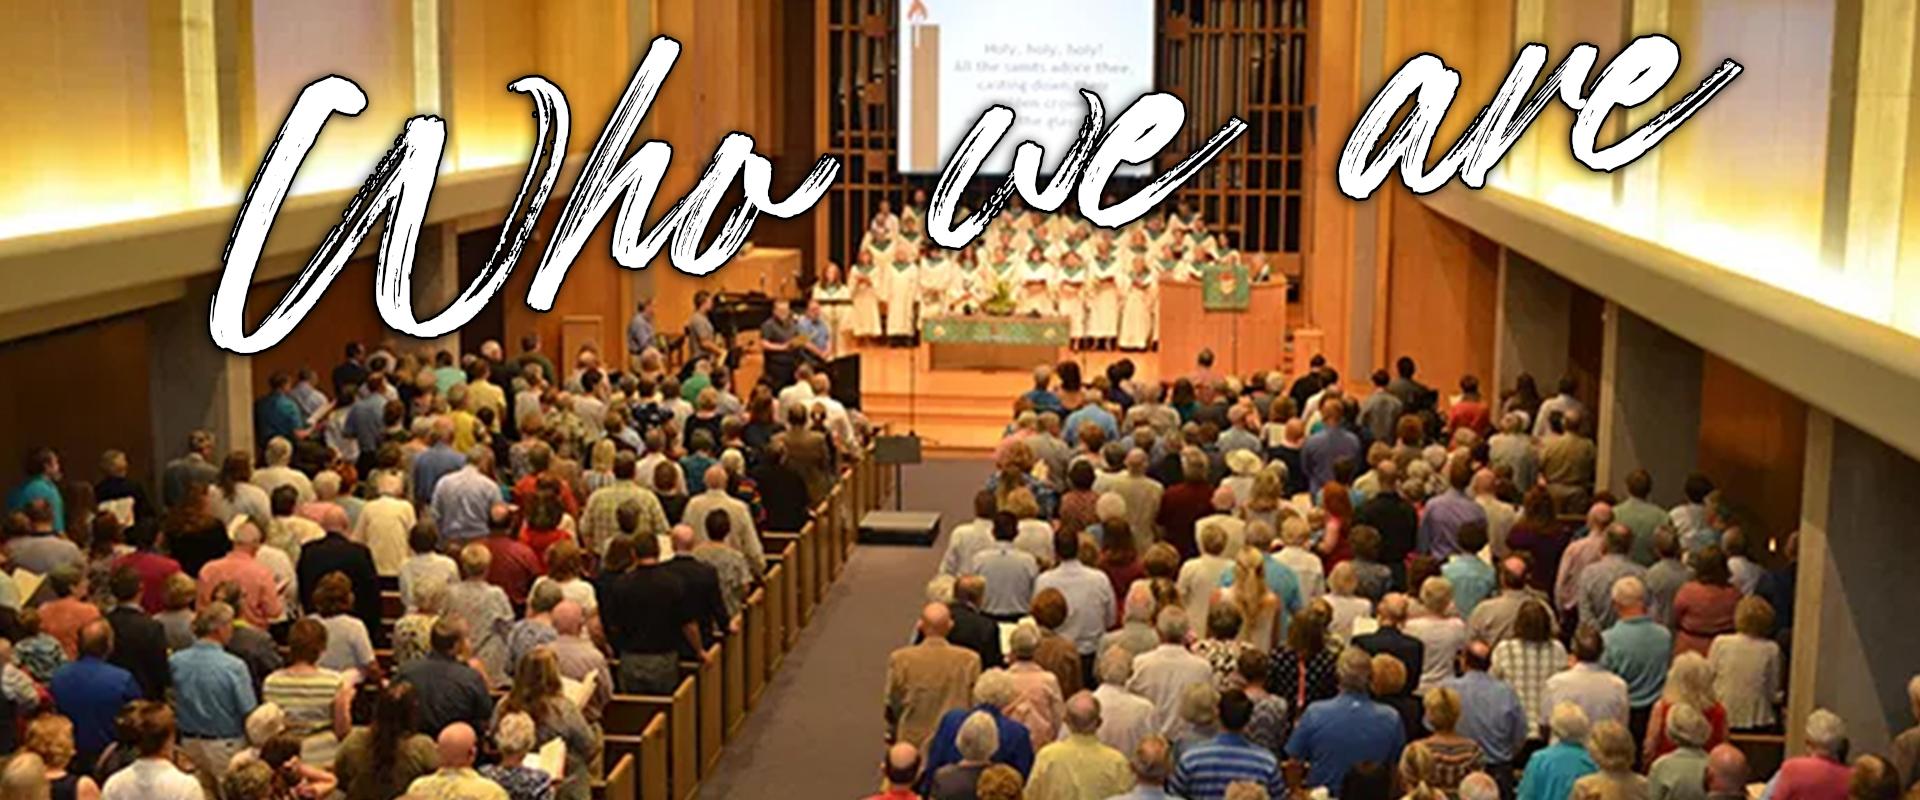 wesley umc congregation